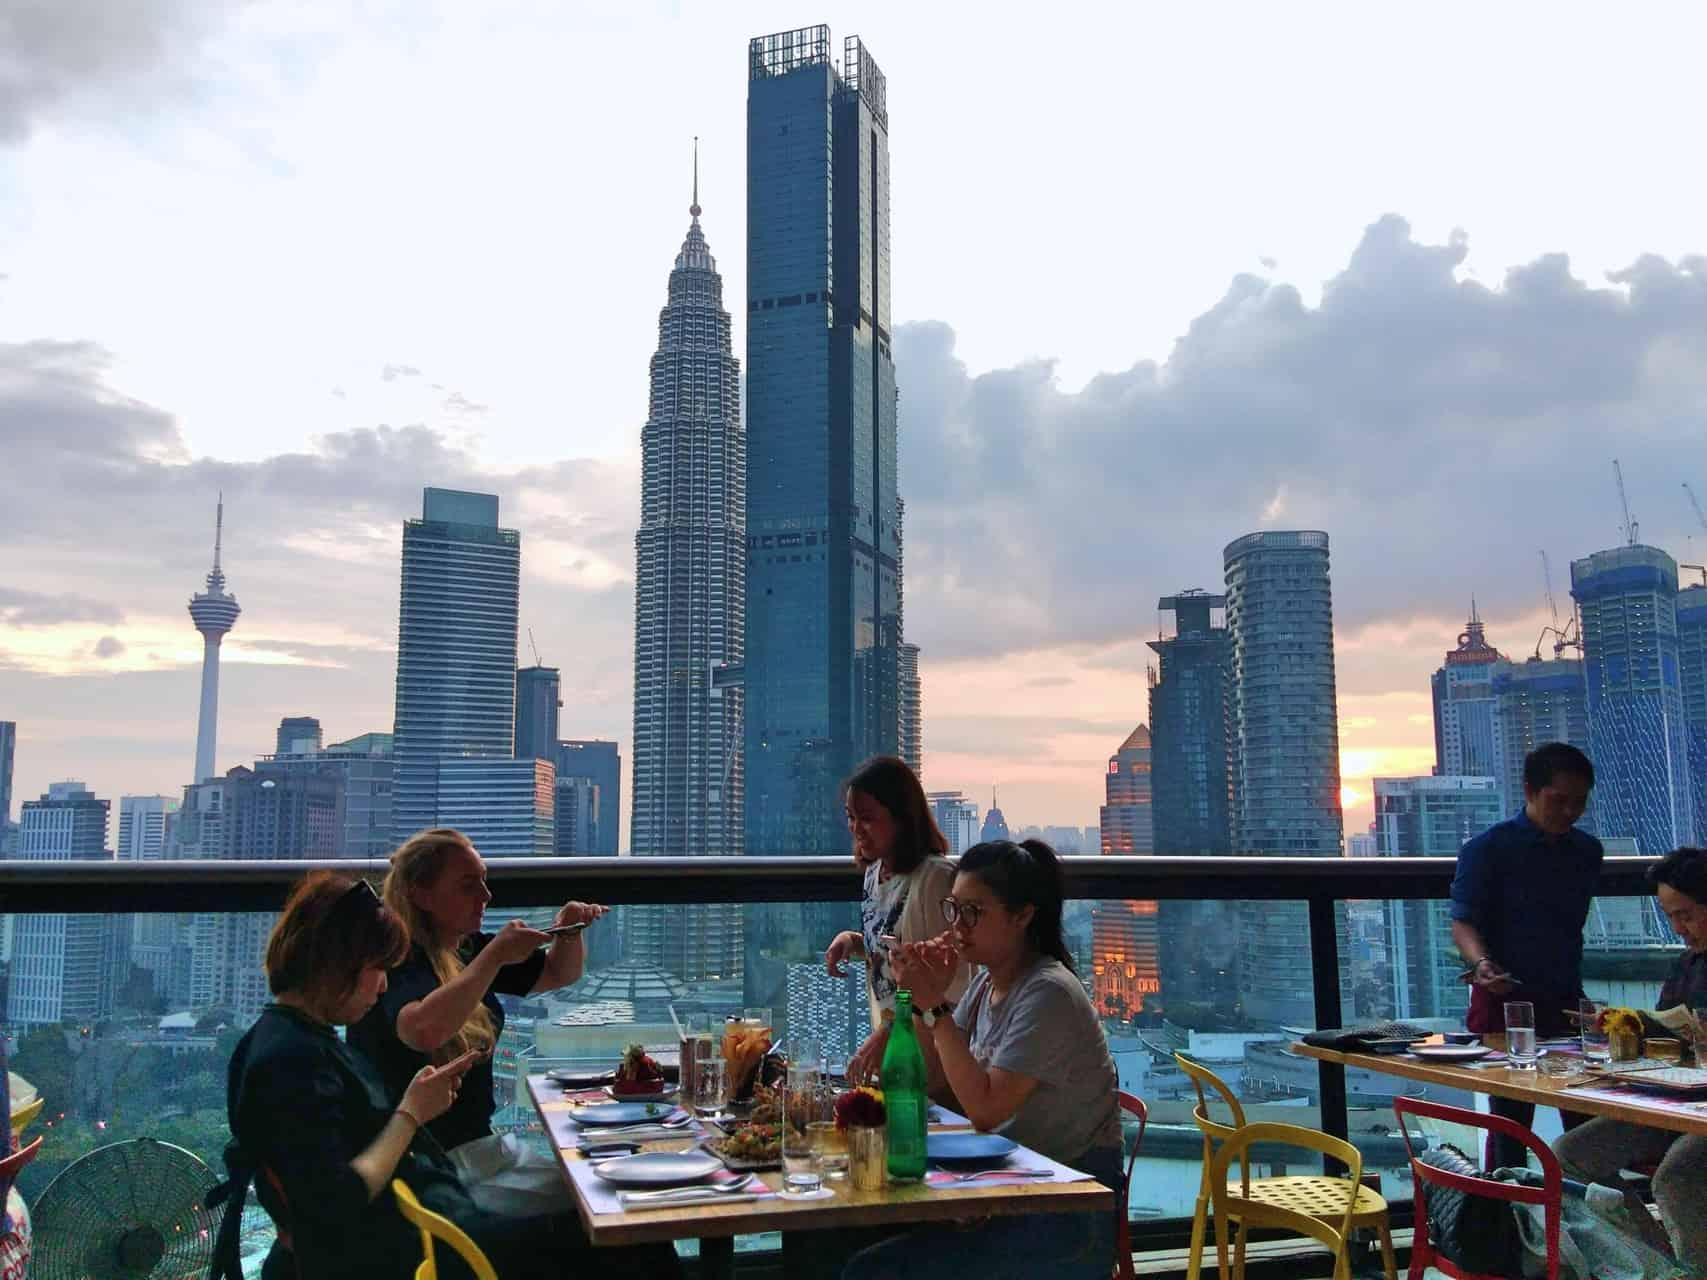 Kuala-Lumpur-city-guide-Malaysia-Travel-Mermaid1